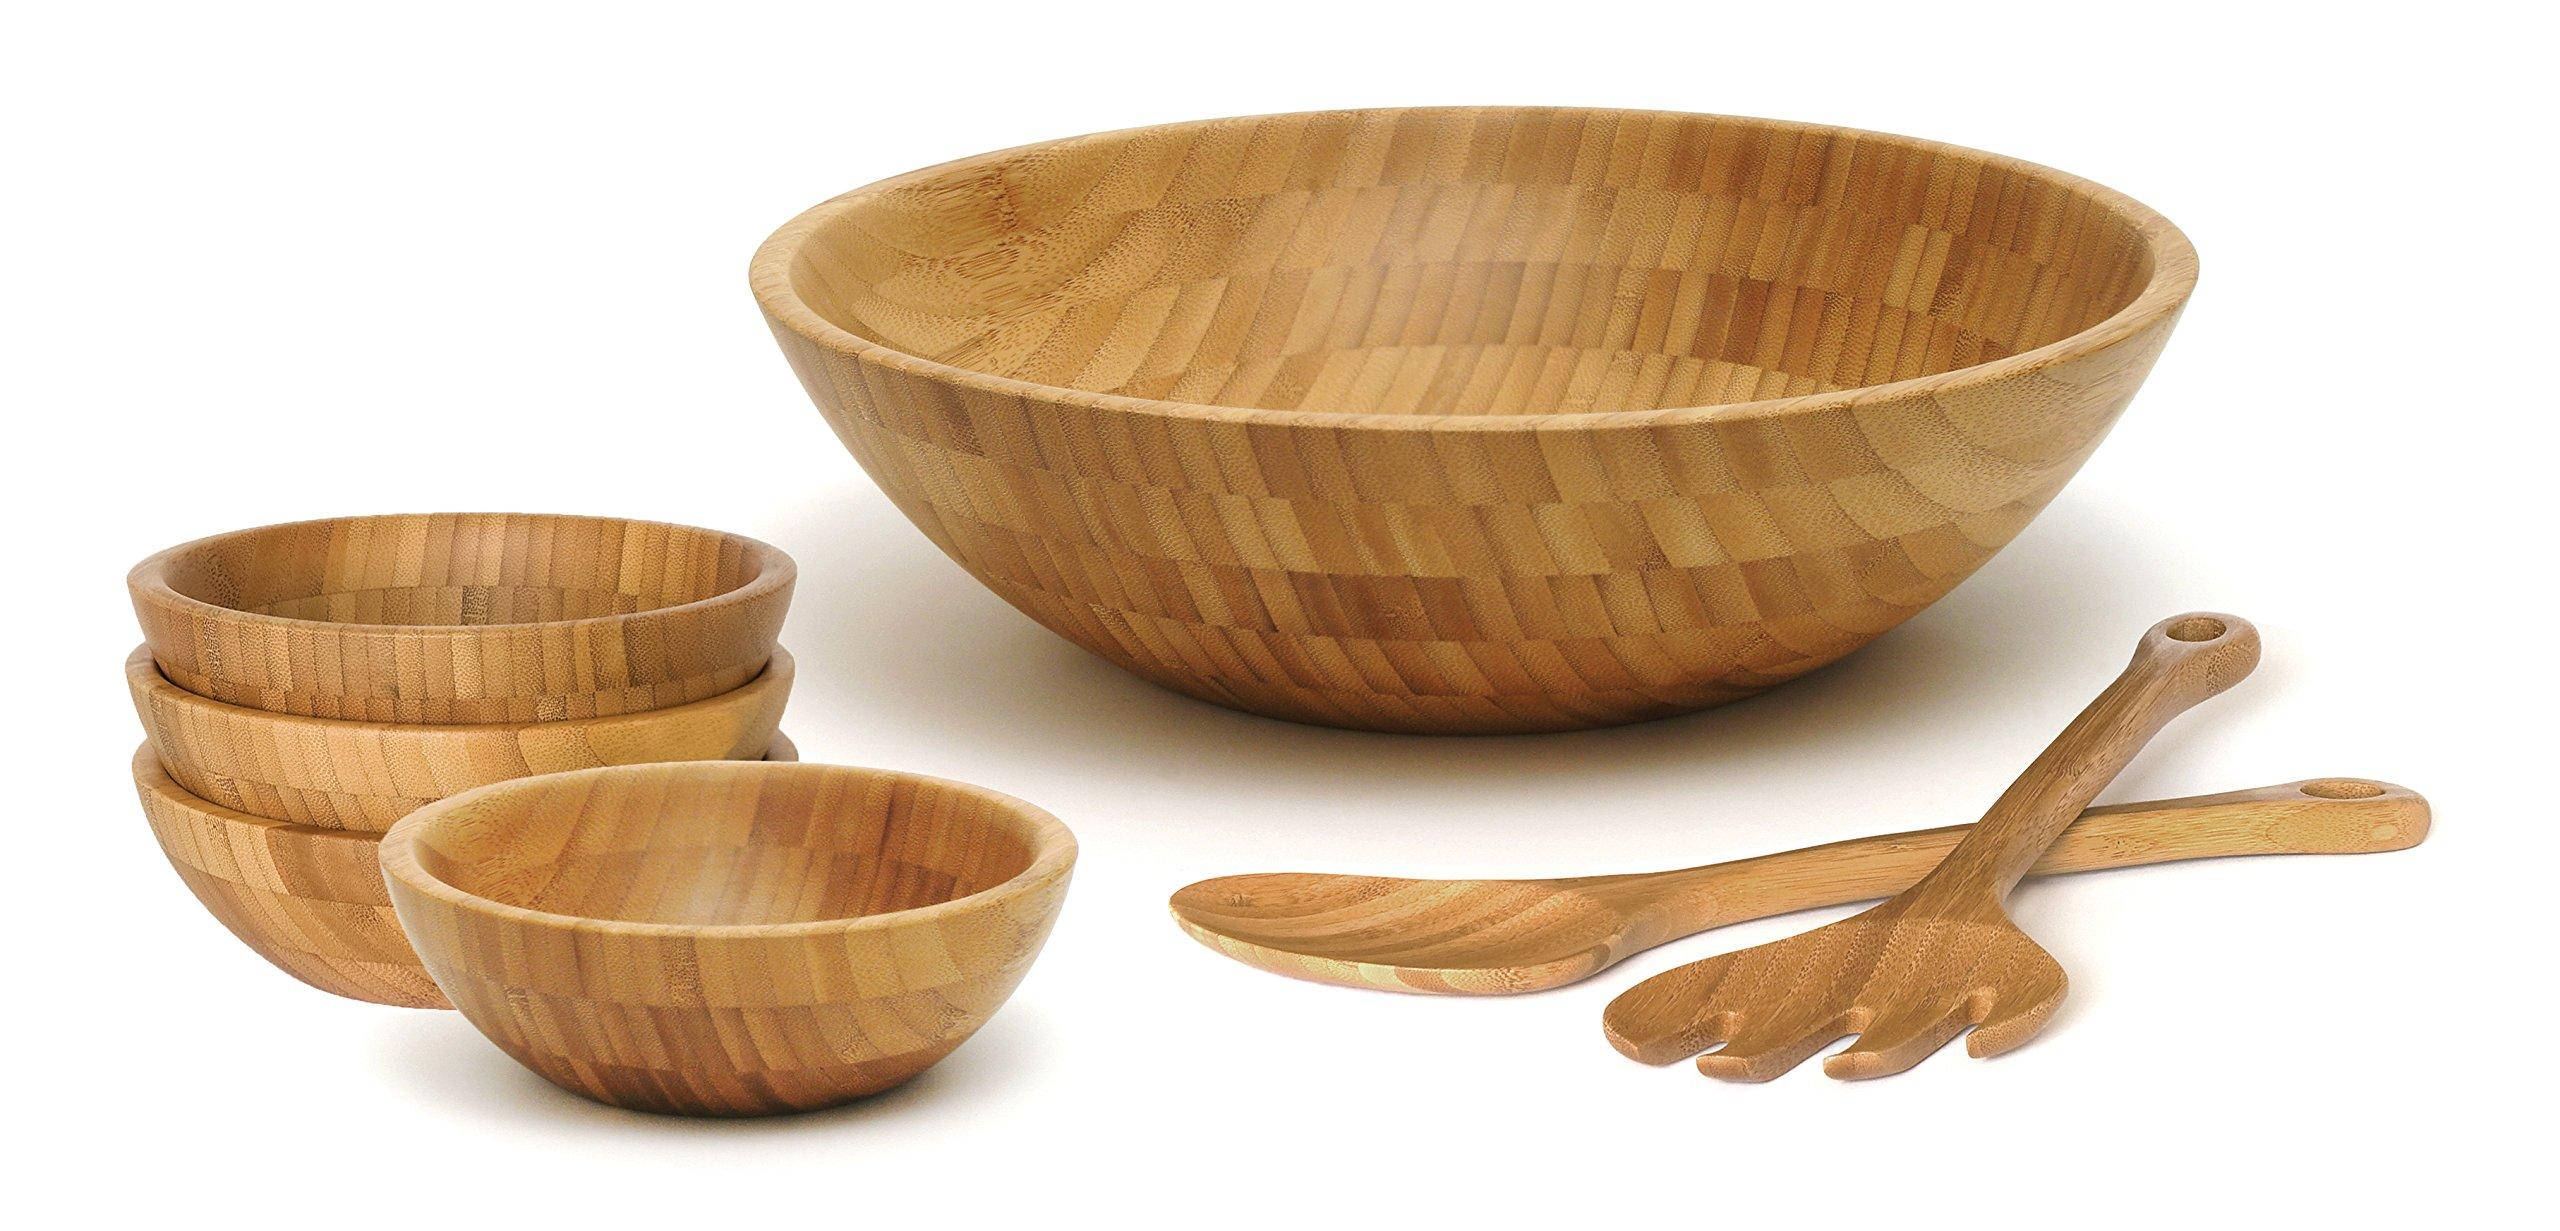 Lipper International 8204-7 Bamboo Wood Salad Bowls with Server Utensils, 7-Piece Set, Assorted Sizes